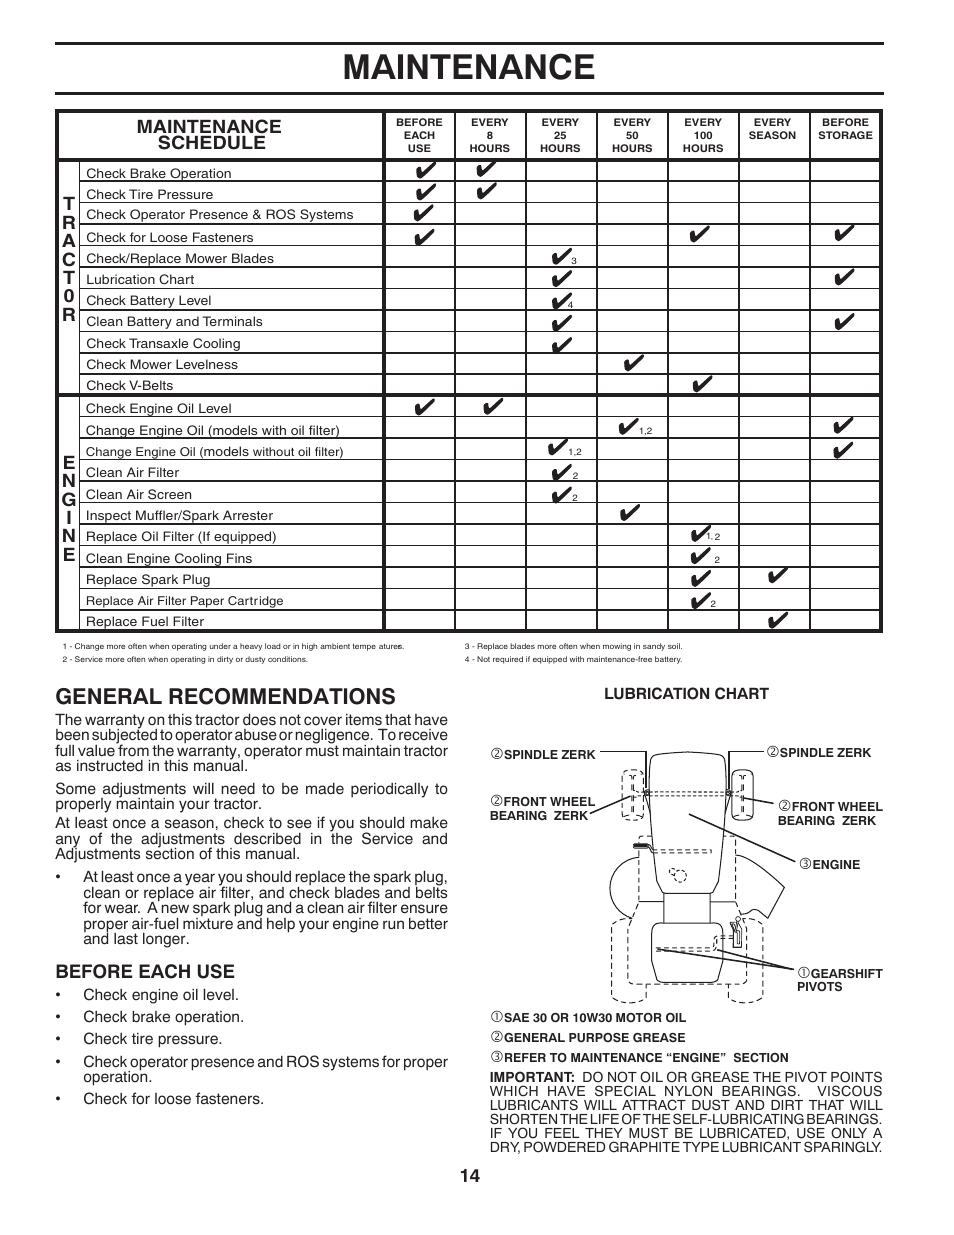 Maintenance, General recommendations, Maintenance schedule